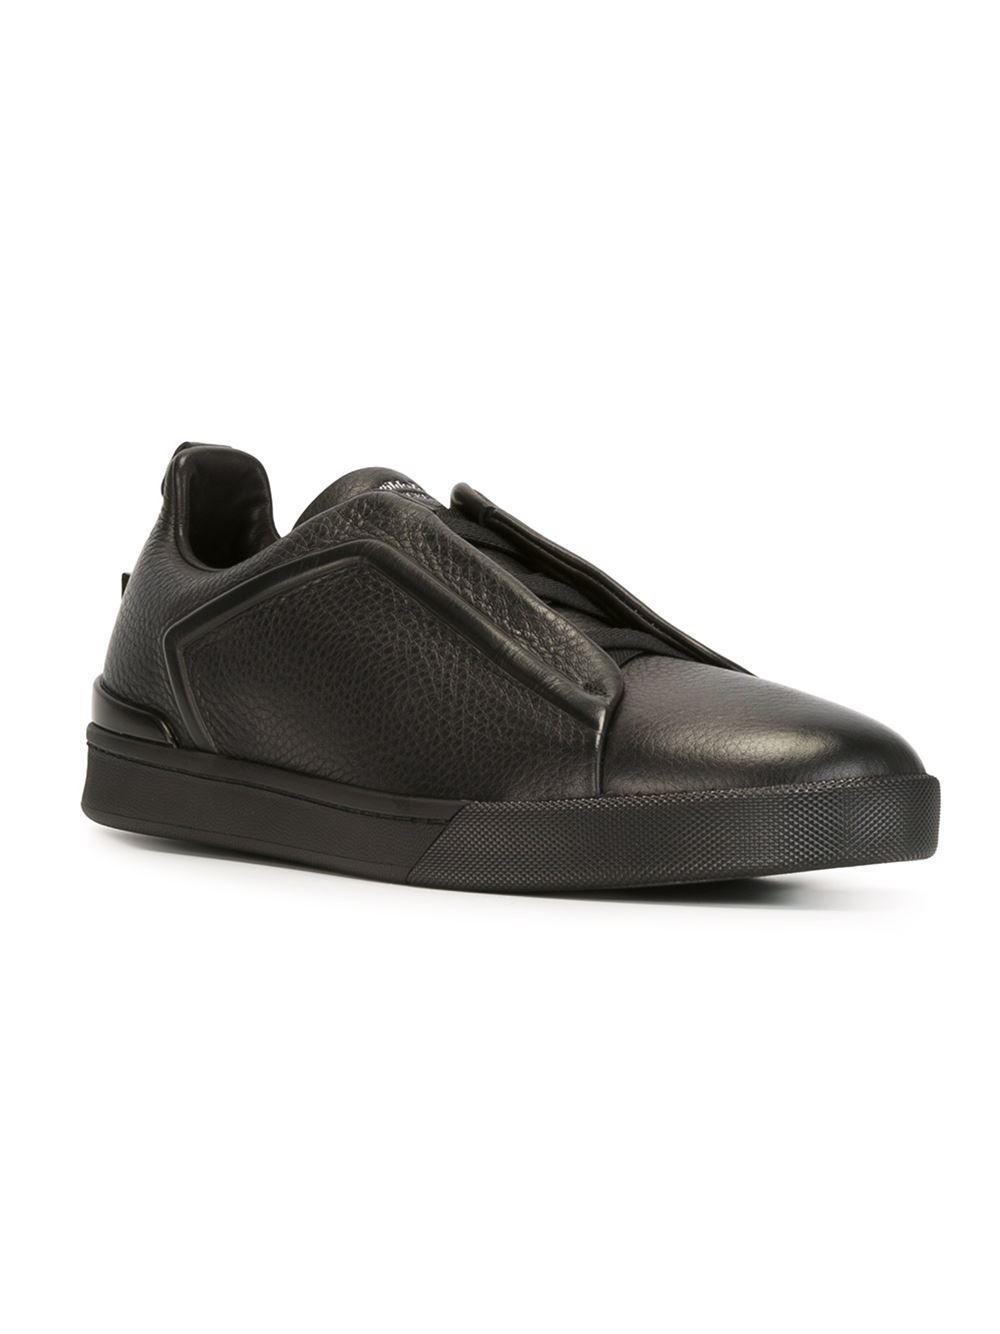 Triple Stitch Full-grain Leather Slip-on Sneakers - BlackErmenegildo Zegna Z7Grnz0L